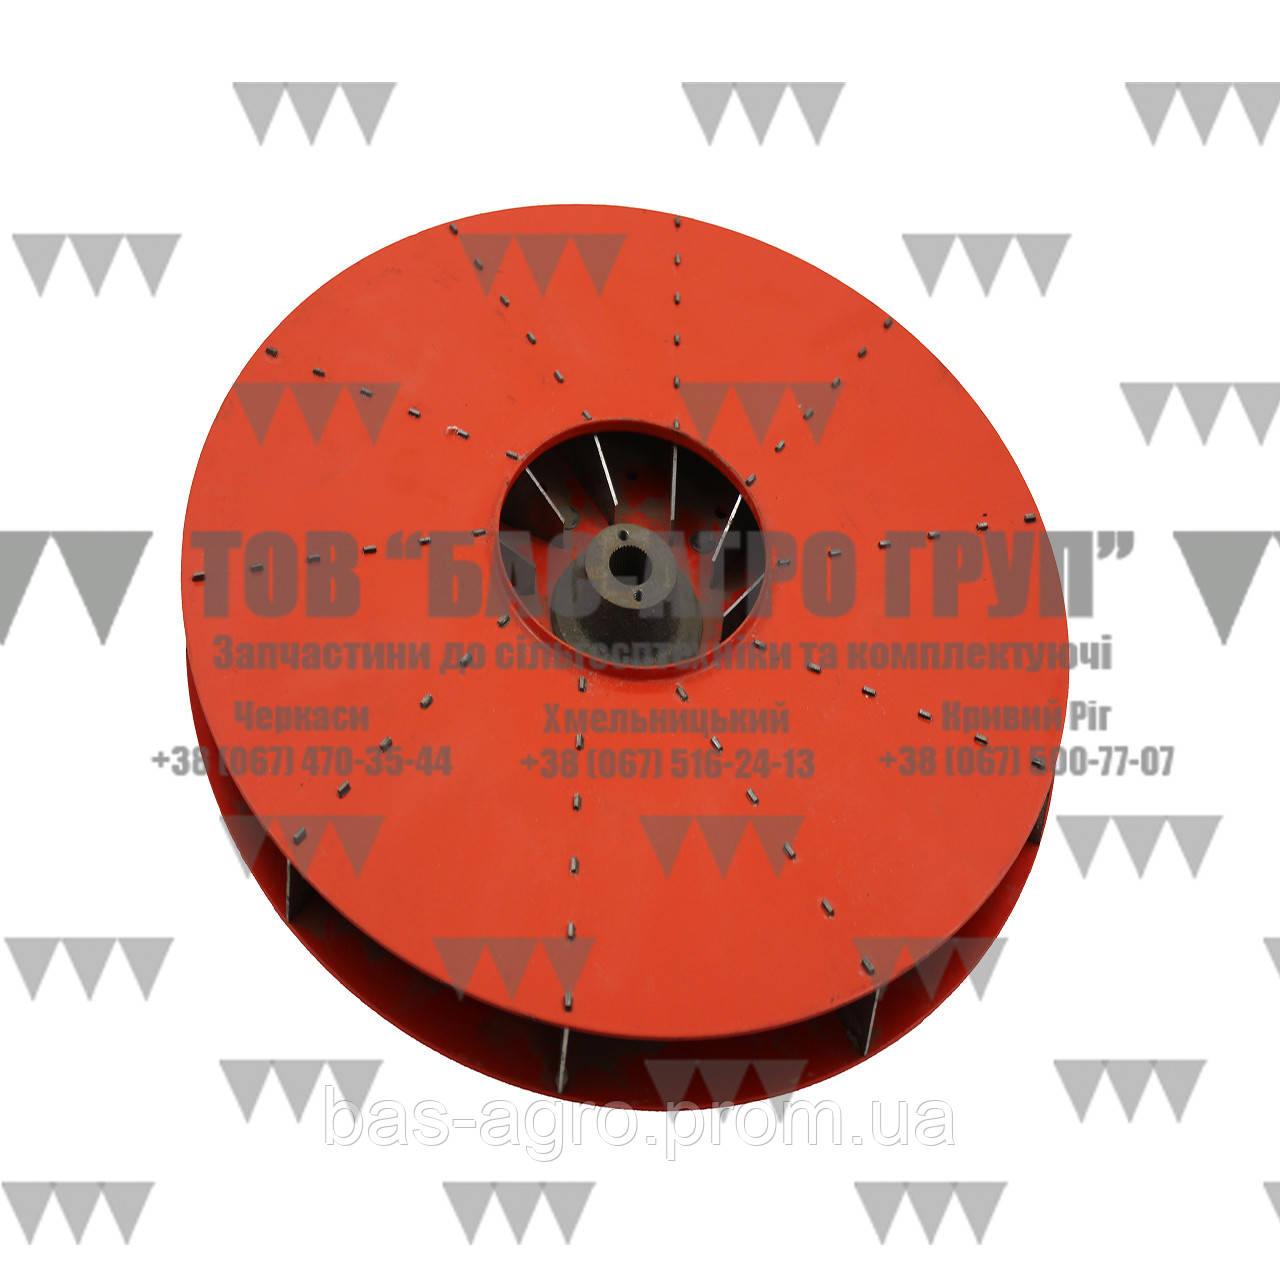 Крыльчатка вентилятора VLA0206A Kuhn Оригинал